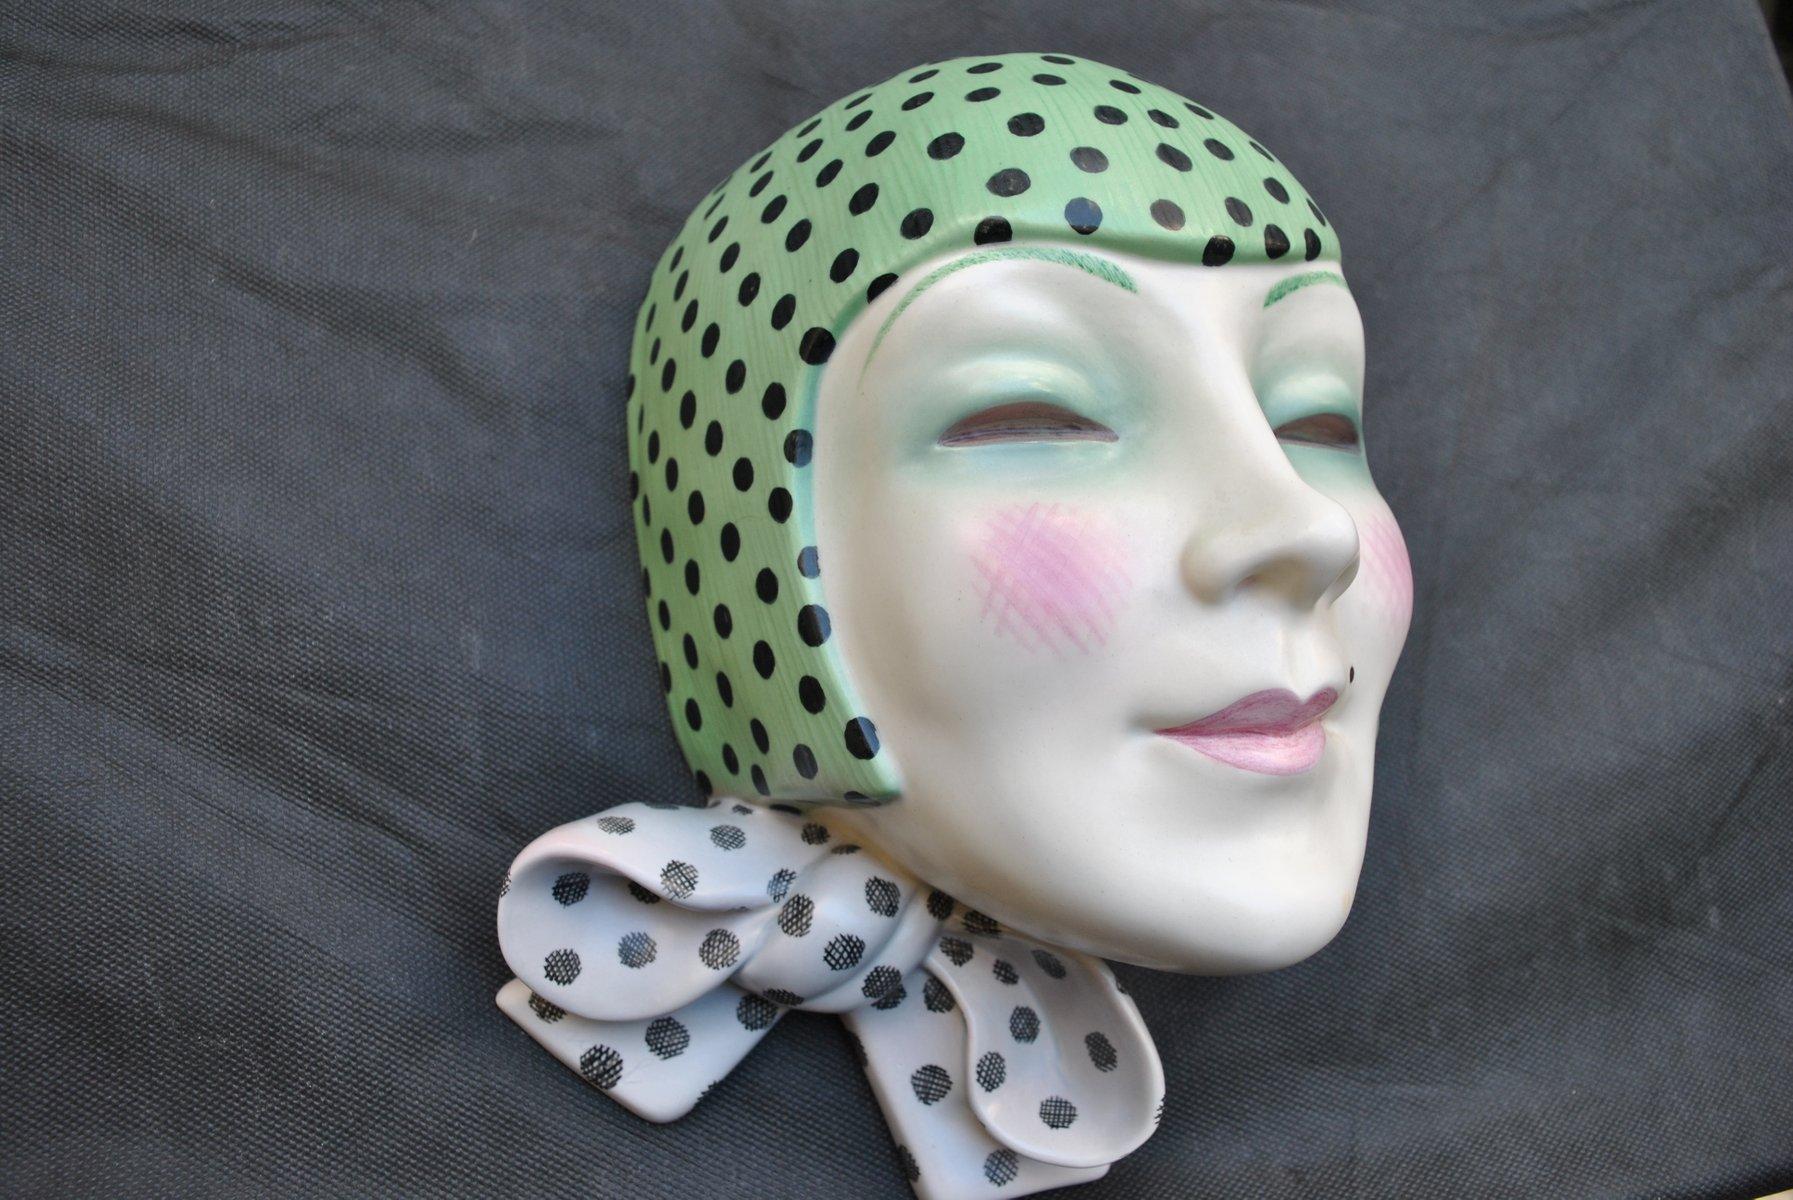 Art Deco Italian Mask With Knot By Helen Konig Scavini For